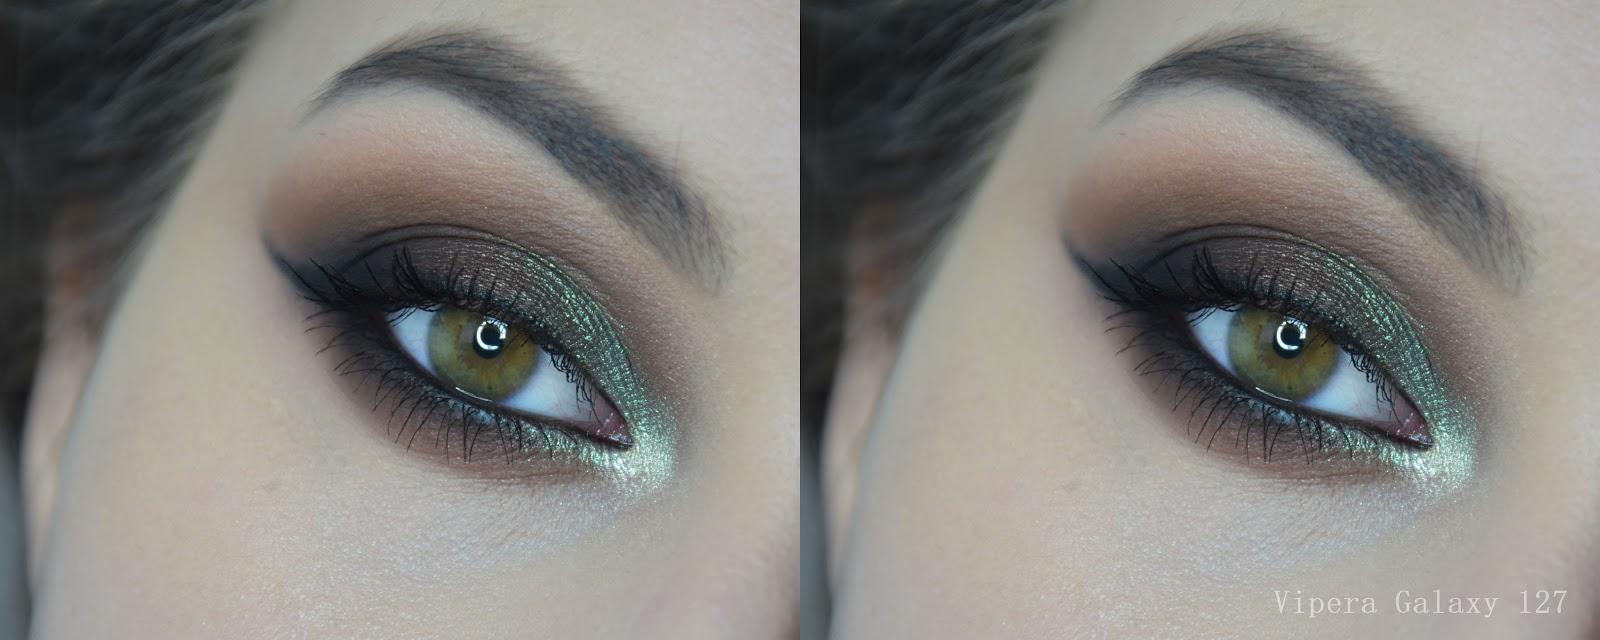 pigment vipera galaxy 127 swatch, makijaż, zieleń, zielony makijaż oczu